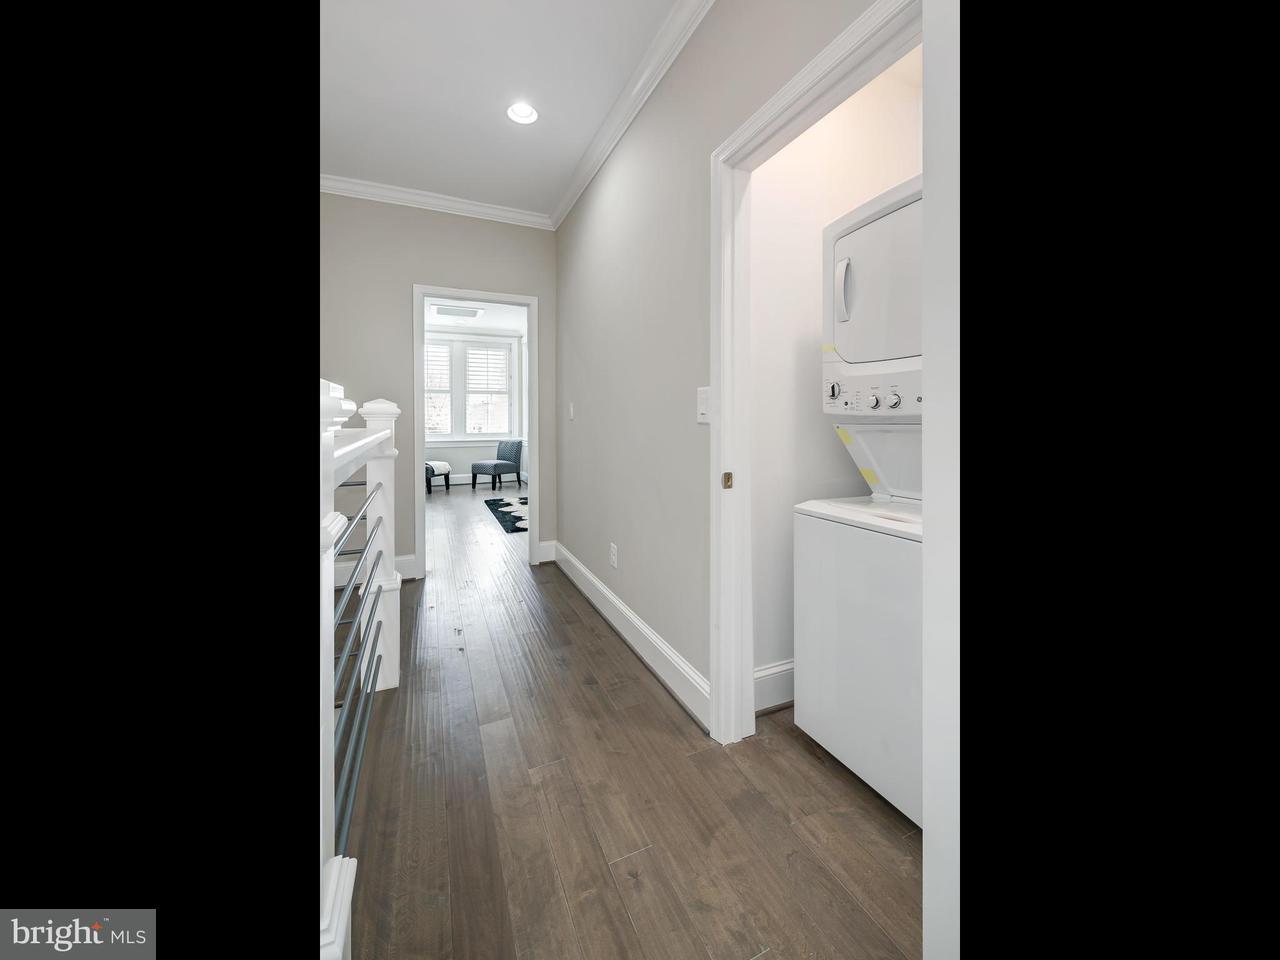 Additional photo for property listing at 227 12th St Ne 227 12th St Ne Washington, 컬럼비아주 20002 미국